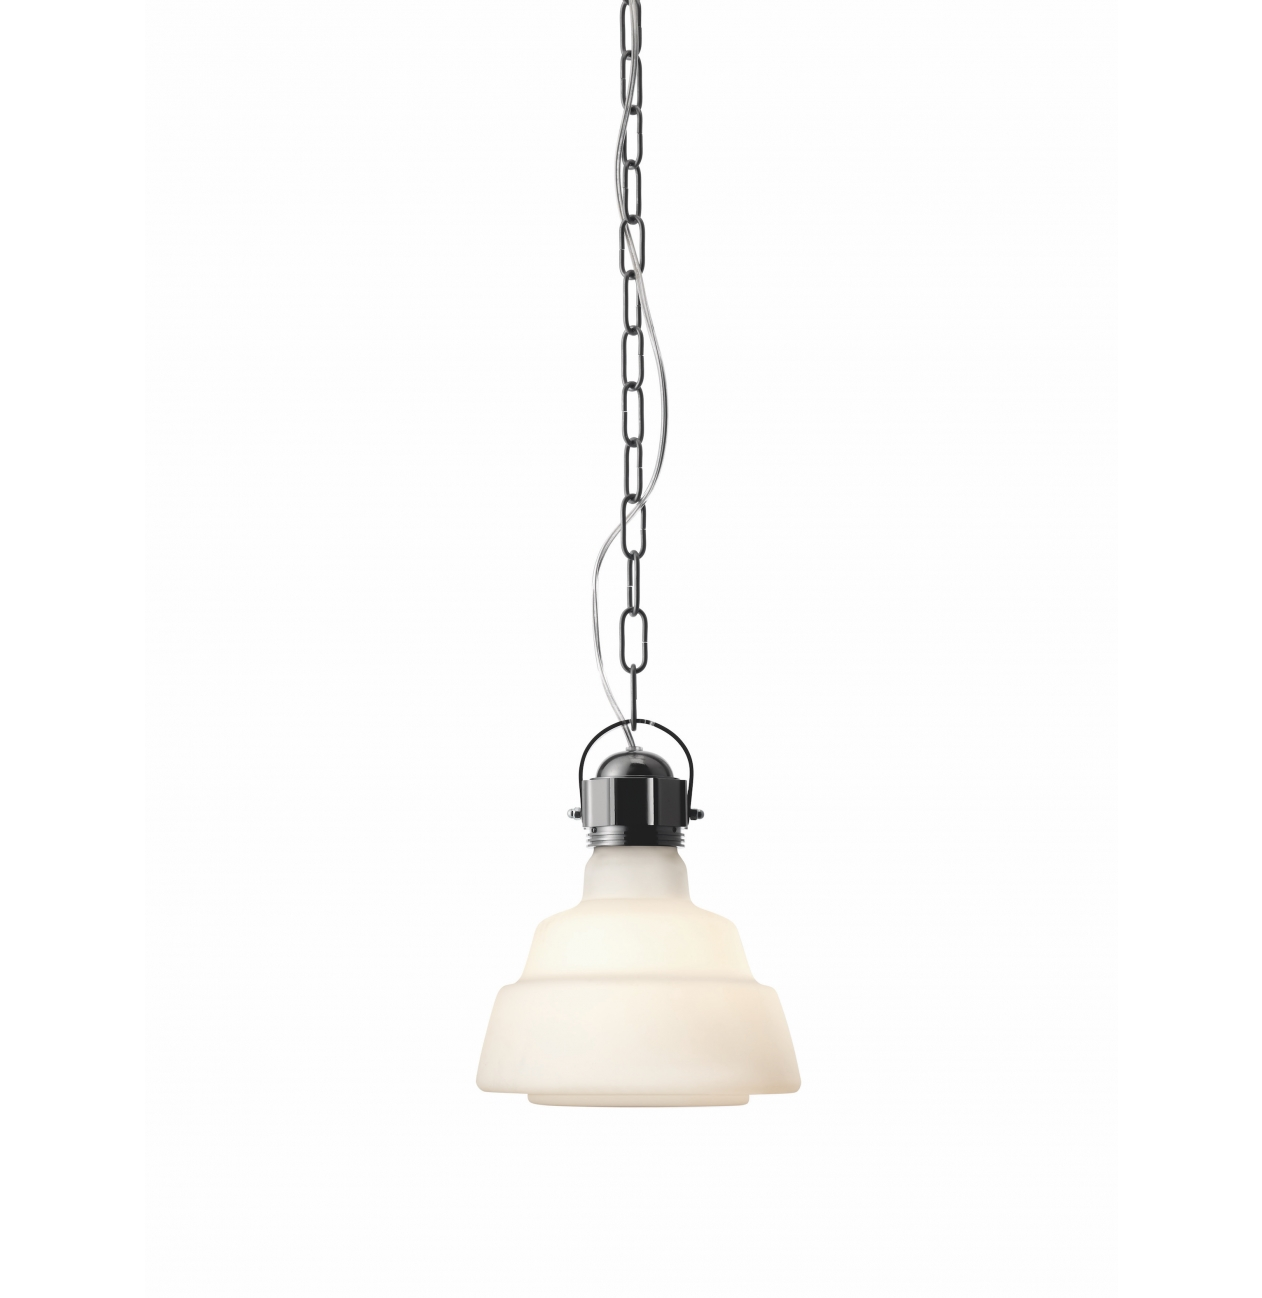 diesel by foscarini hanglamp glas piccola versteeg lichtstudio. Black Bedroom Furniture Sets. Home Design Ideas